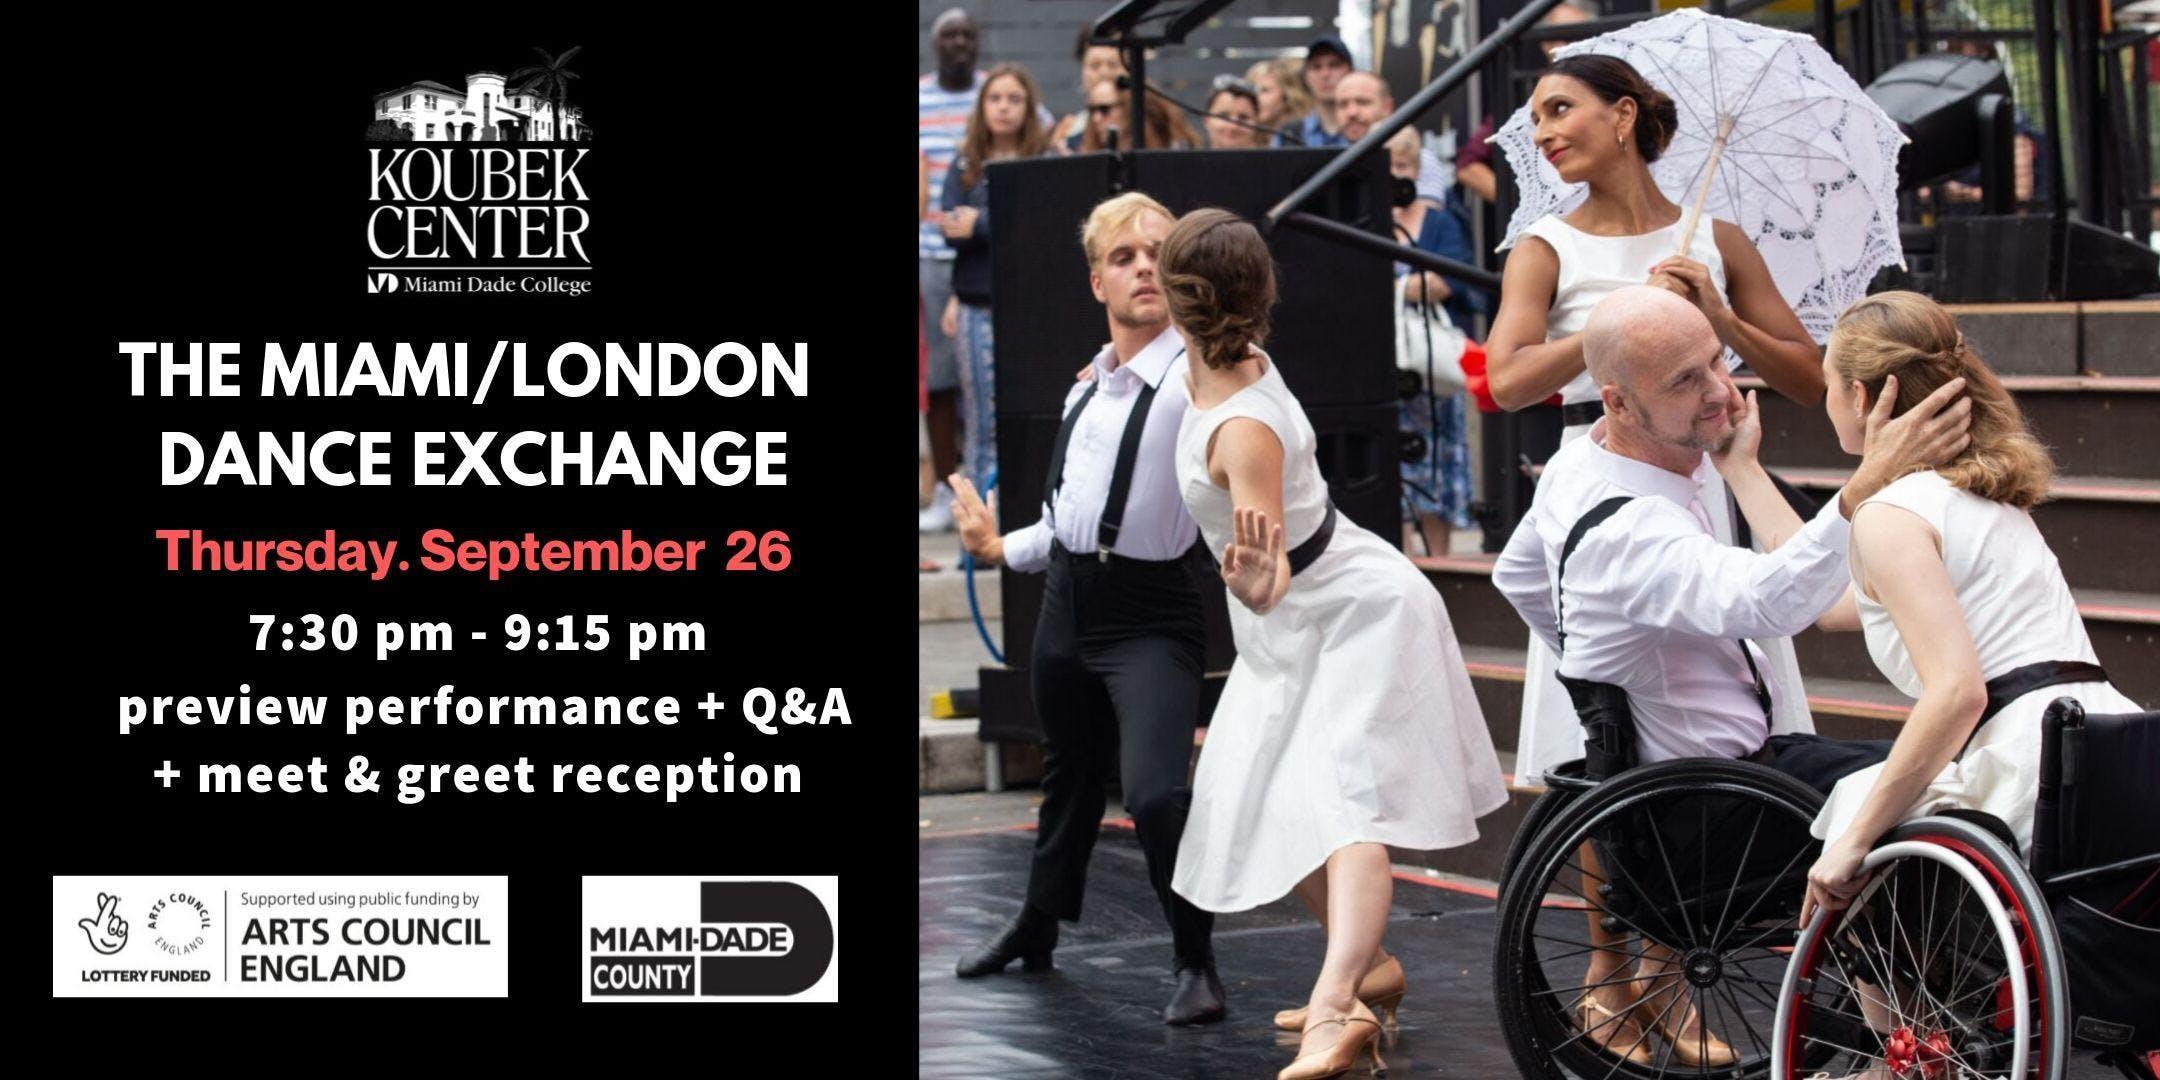 The Miami/London Dance Exchange